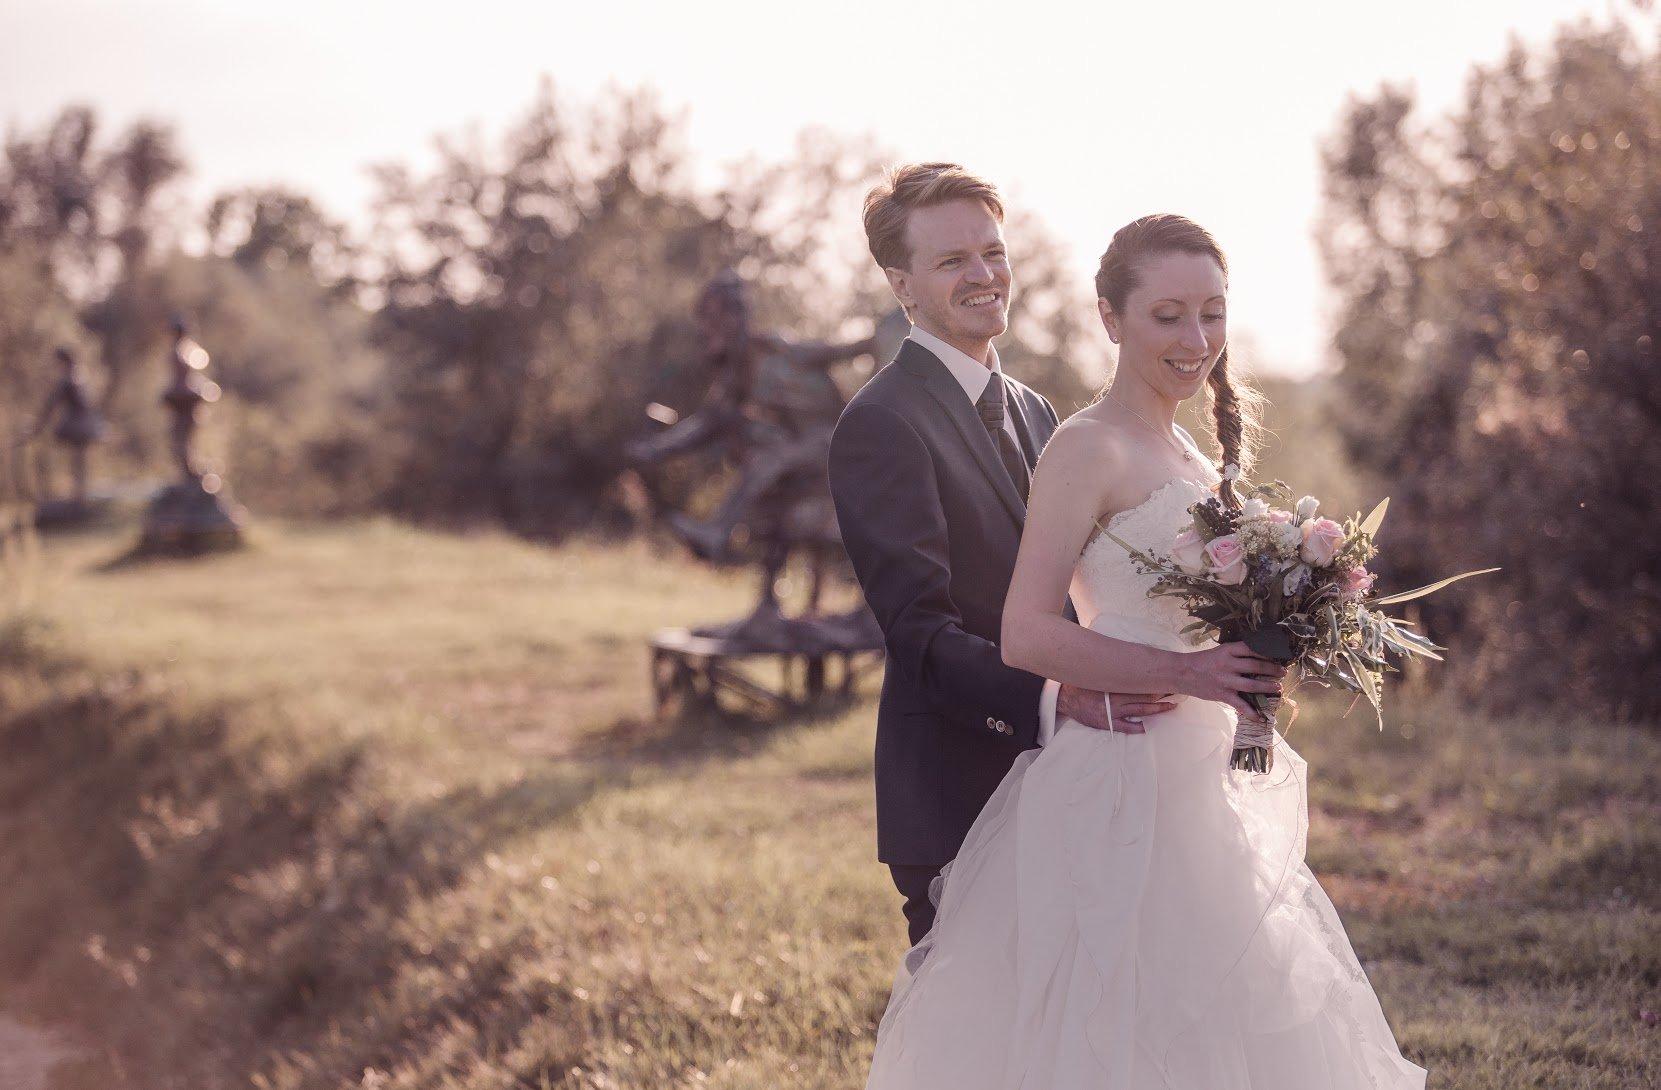 Irene ed Emanuele sposi